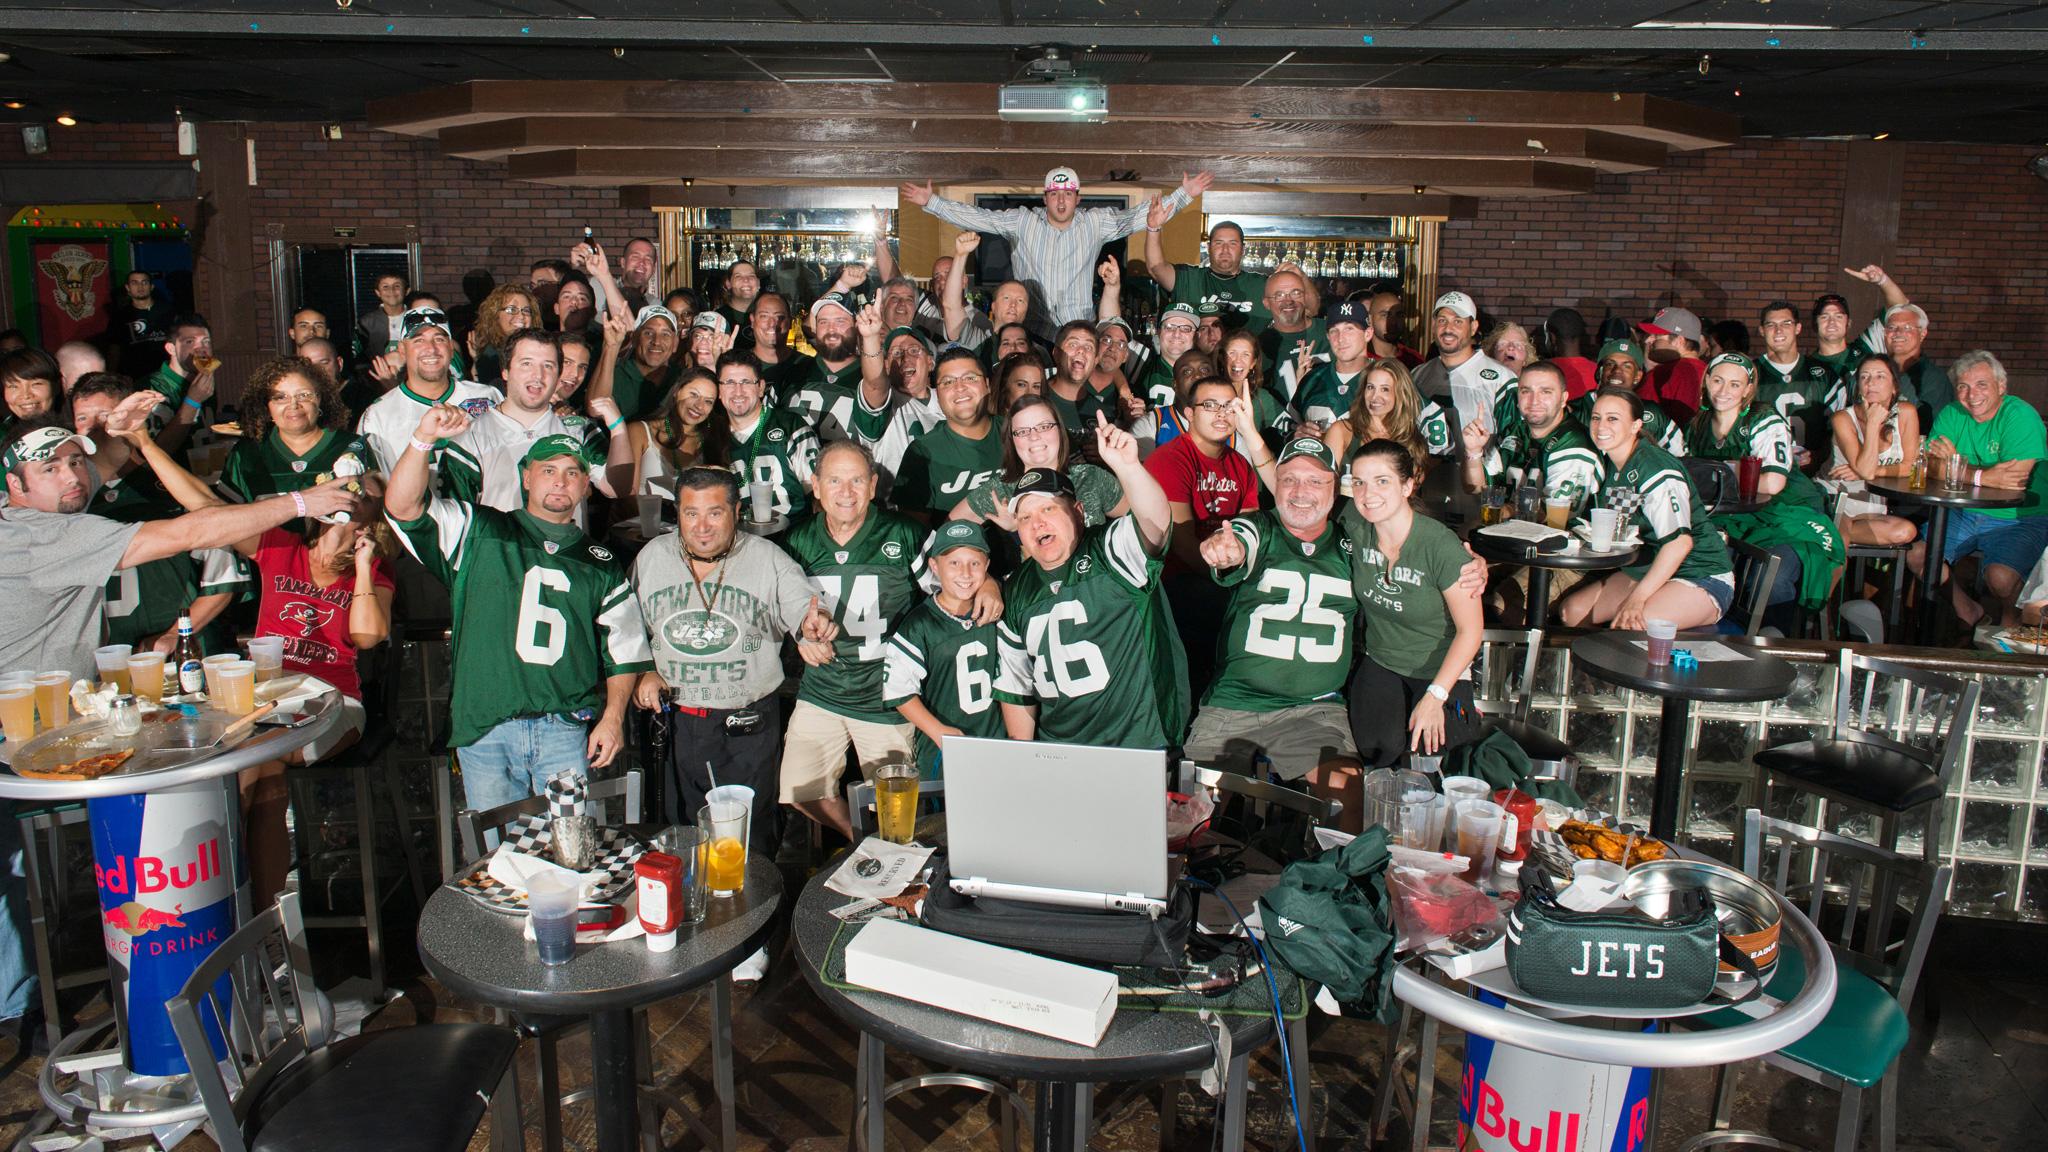 Group Shot taken during week 2 of 2012 season - Jets-vs-Steelers